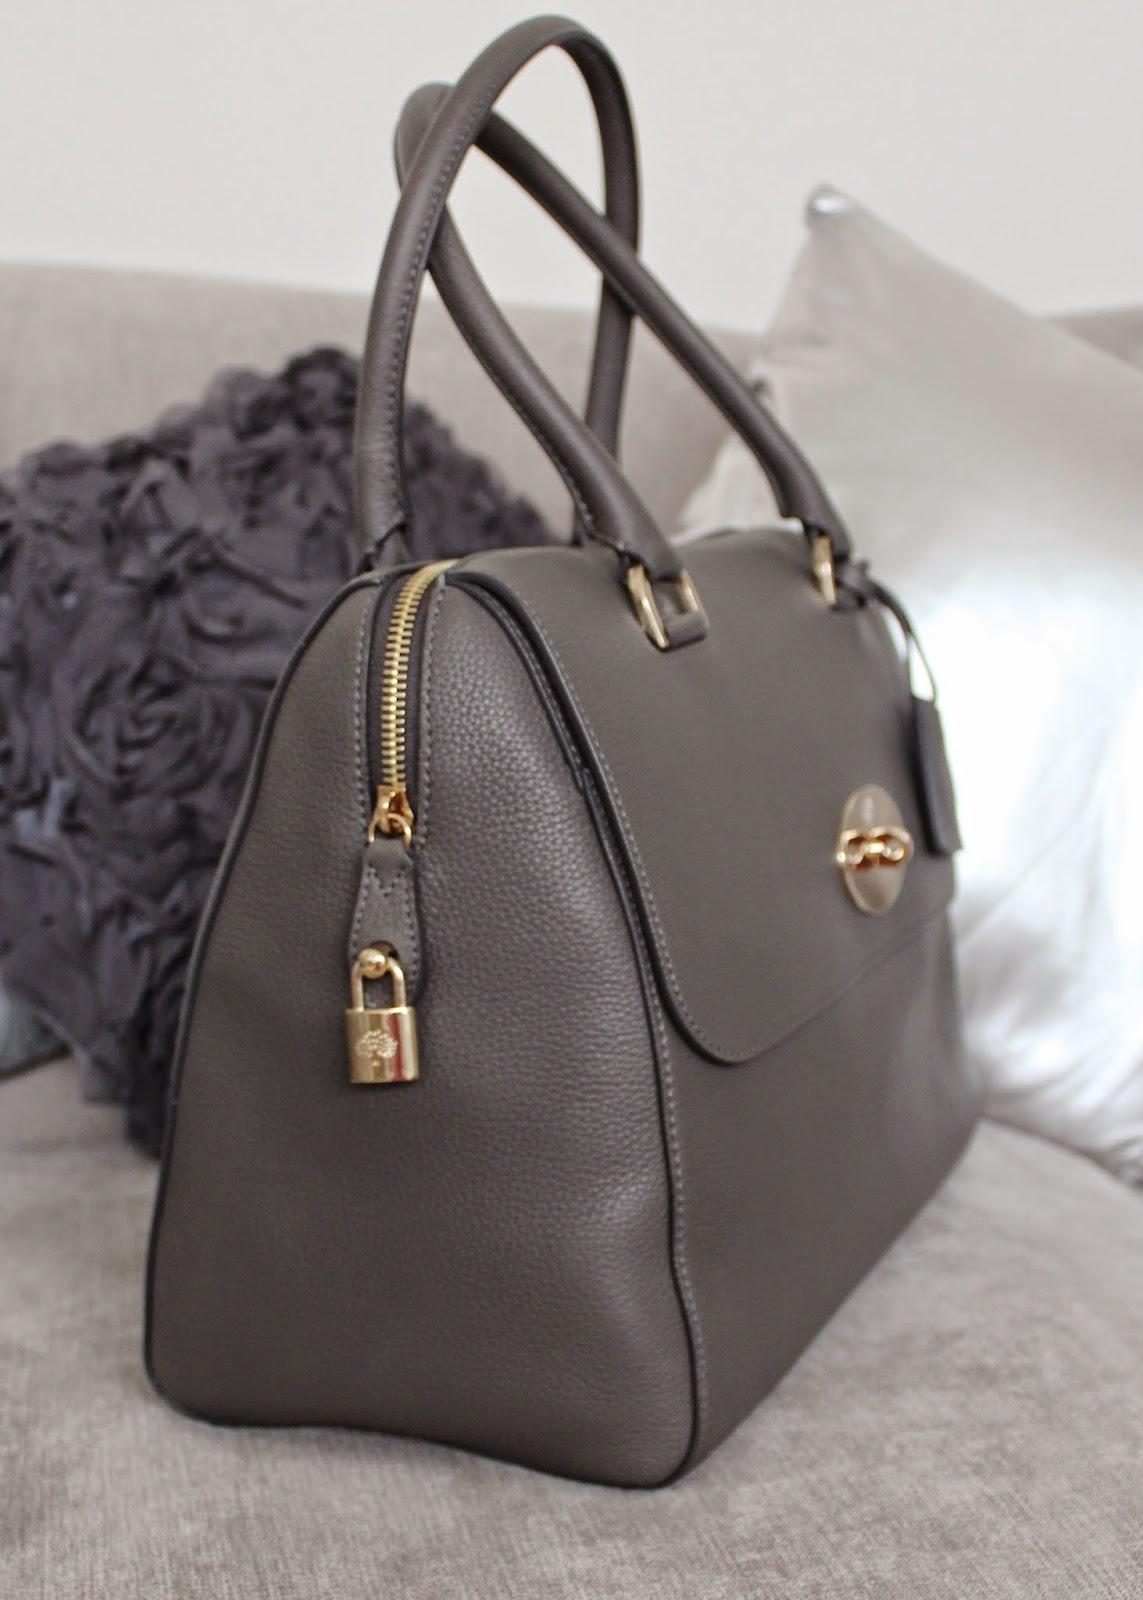 Mulberry Bag Del Rey